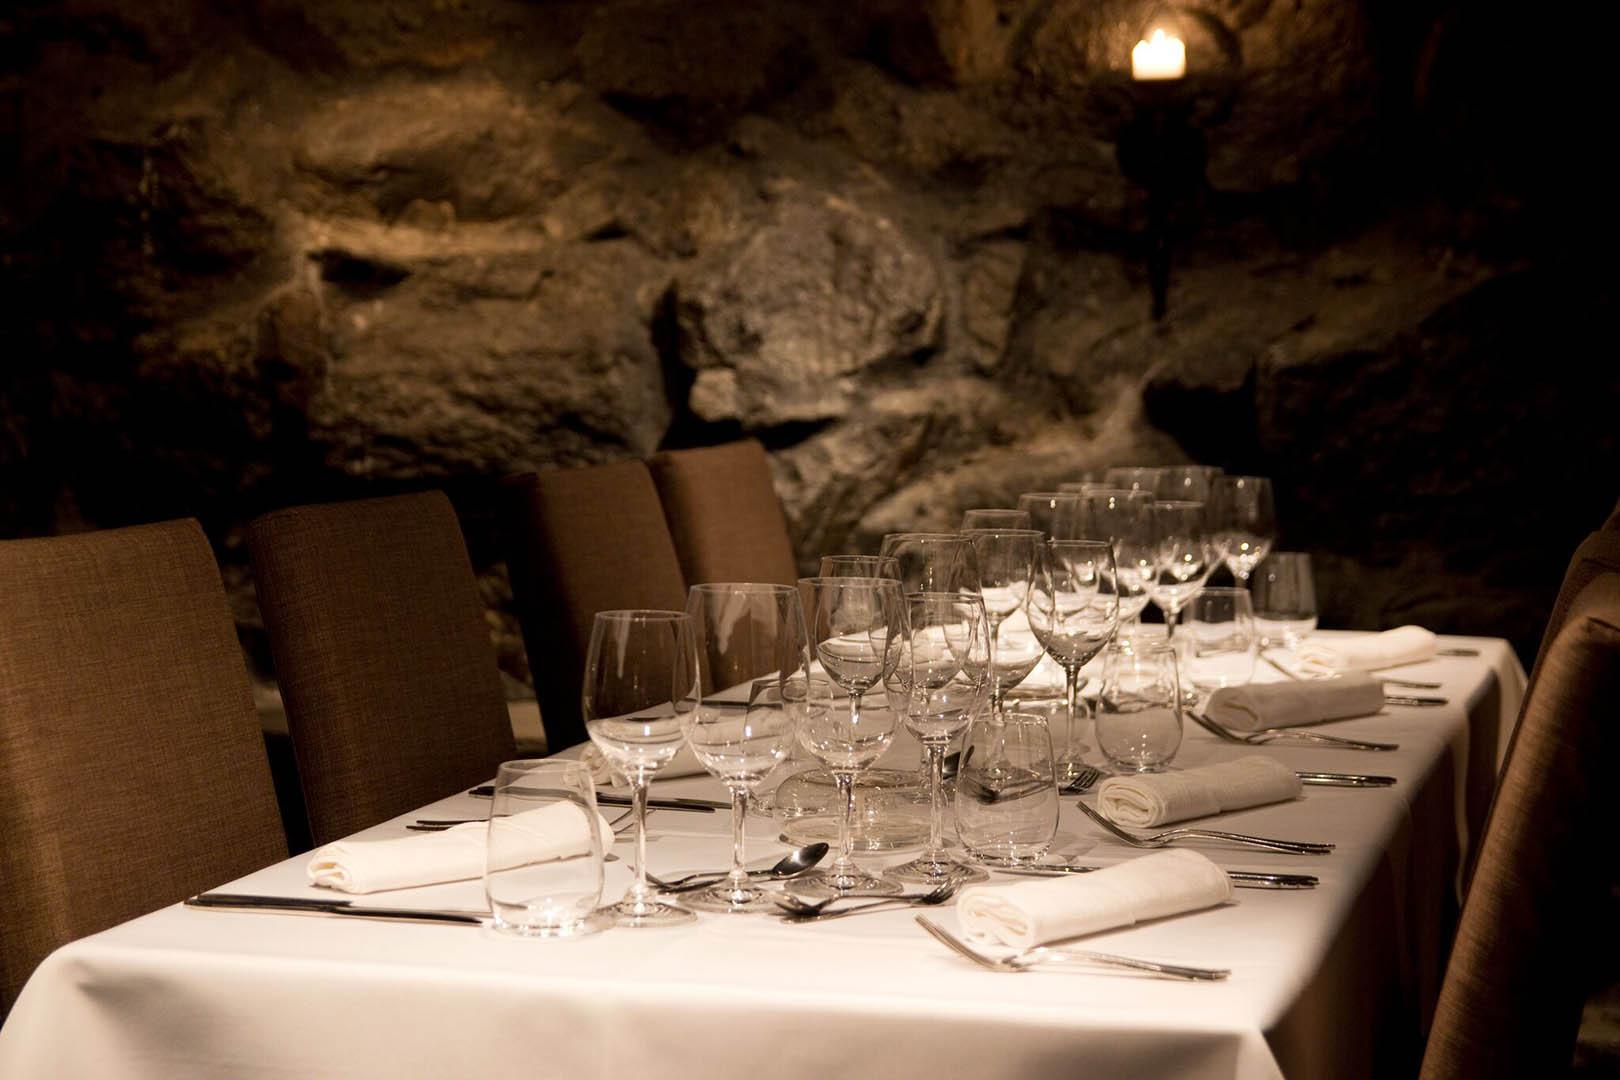 Restaurant Bacchus and Svenska Klubben, the cellar restaurant Bacchus is open in the evenings for à la carte dining